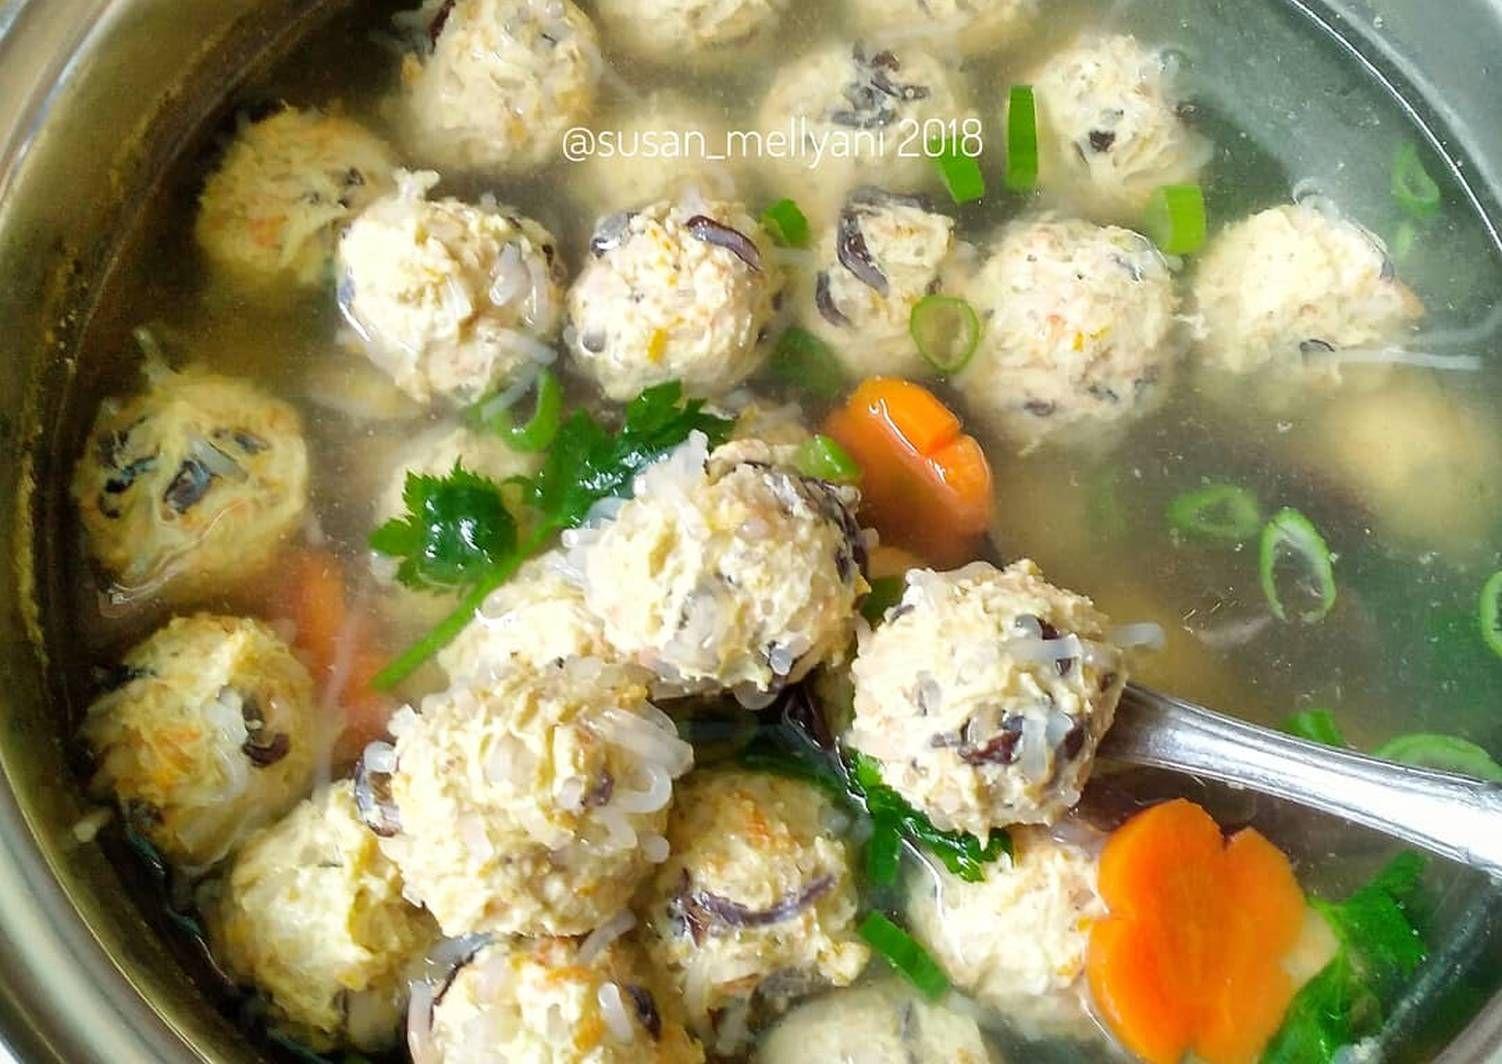 Resep Sup Bakso Serabut Bakso Lohoa Oleh Susan Mellyani Resep Resep Sup Masakan Sup Bakso